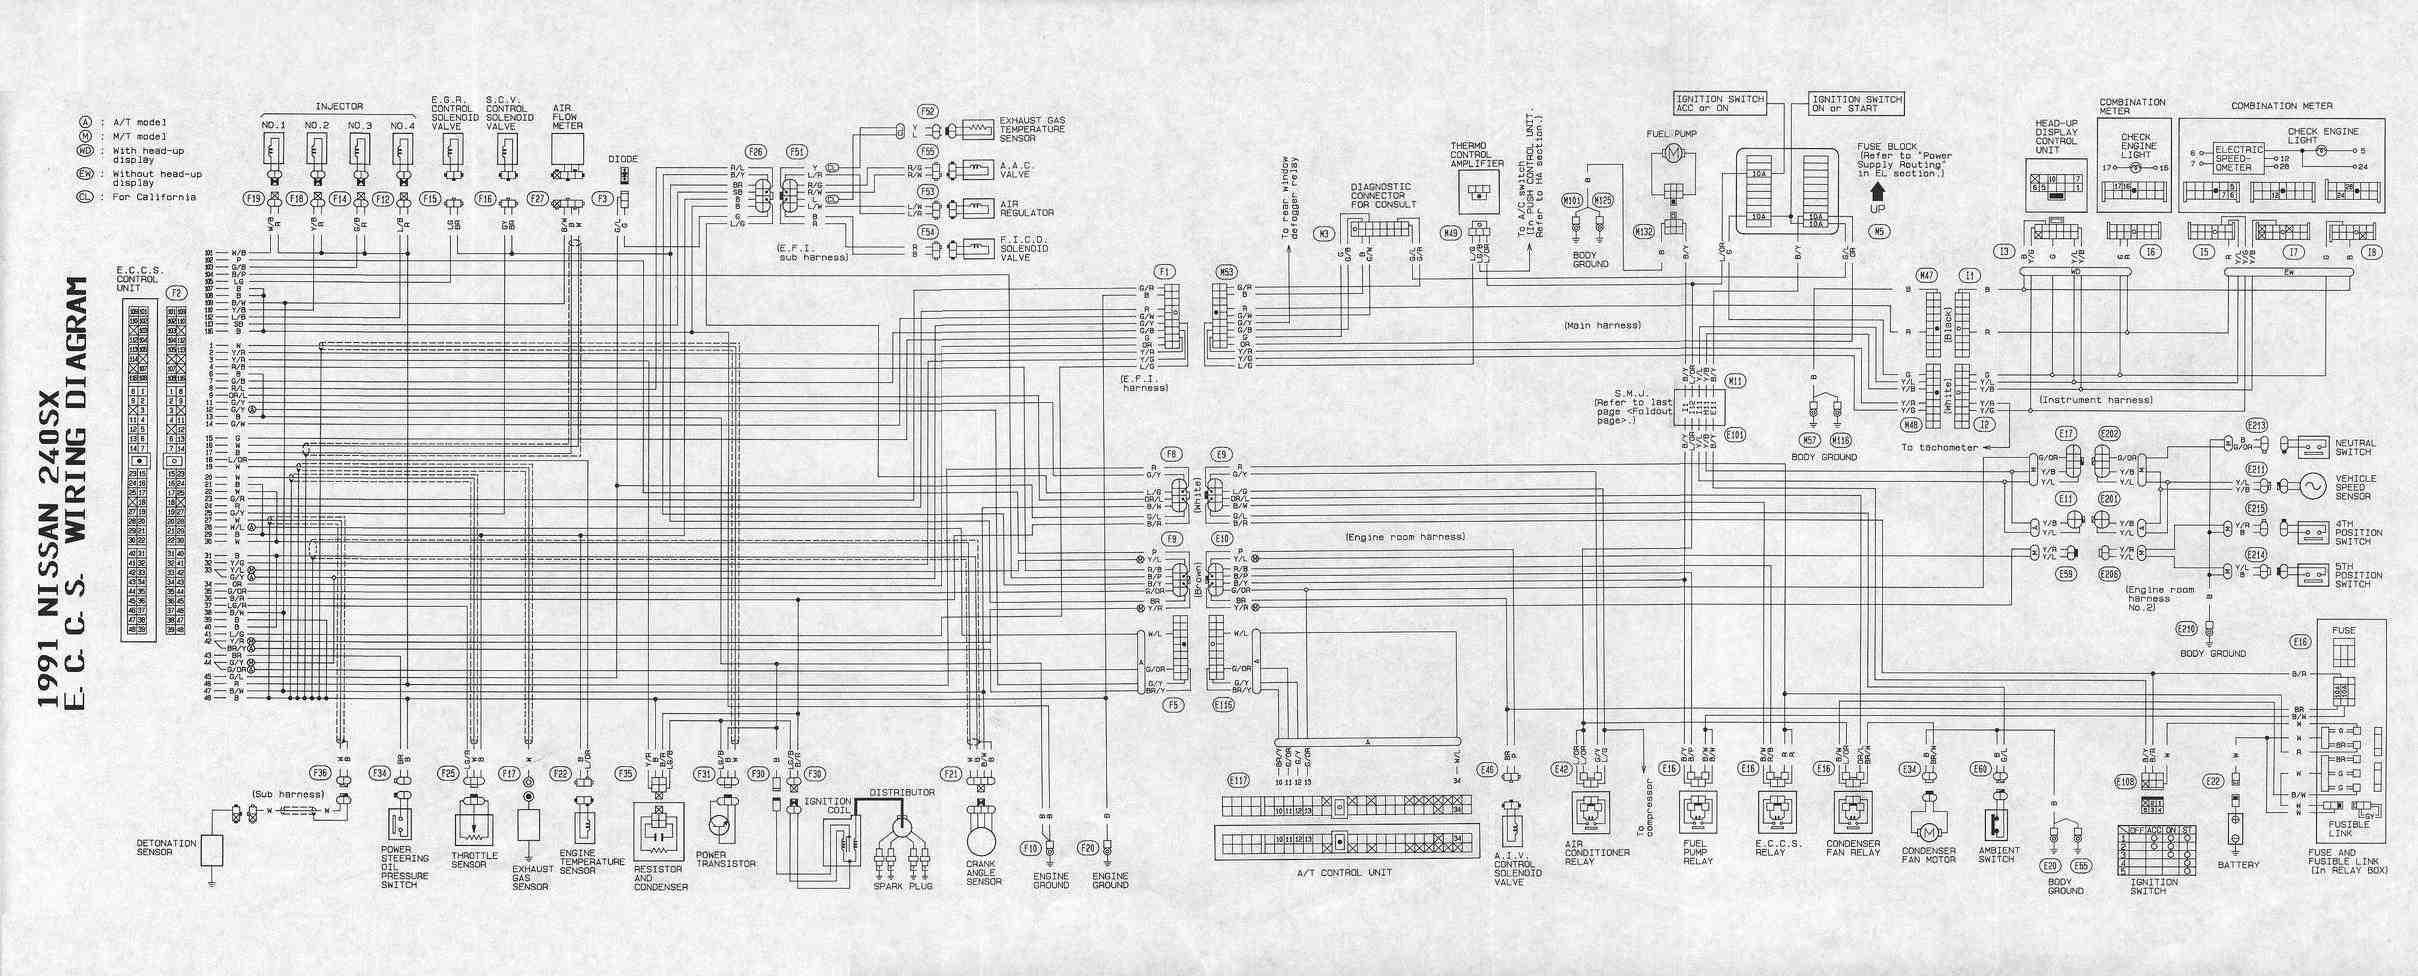 nissan ka24e wiring diagram wiring diagram schematics source rb20det wiring diagram pdf free u2022 oasis [ 2418 x 976 Pixel ]